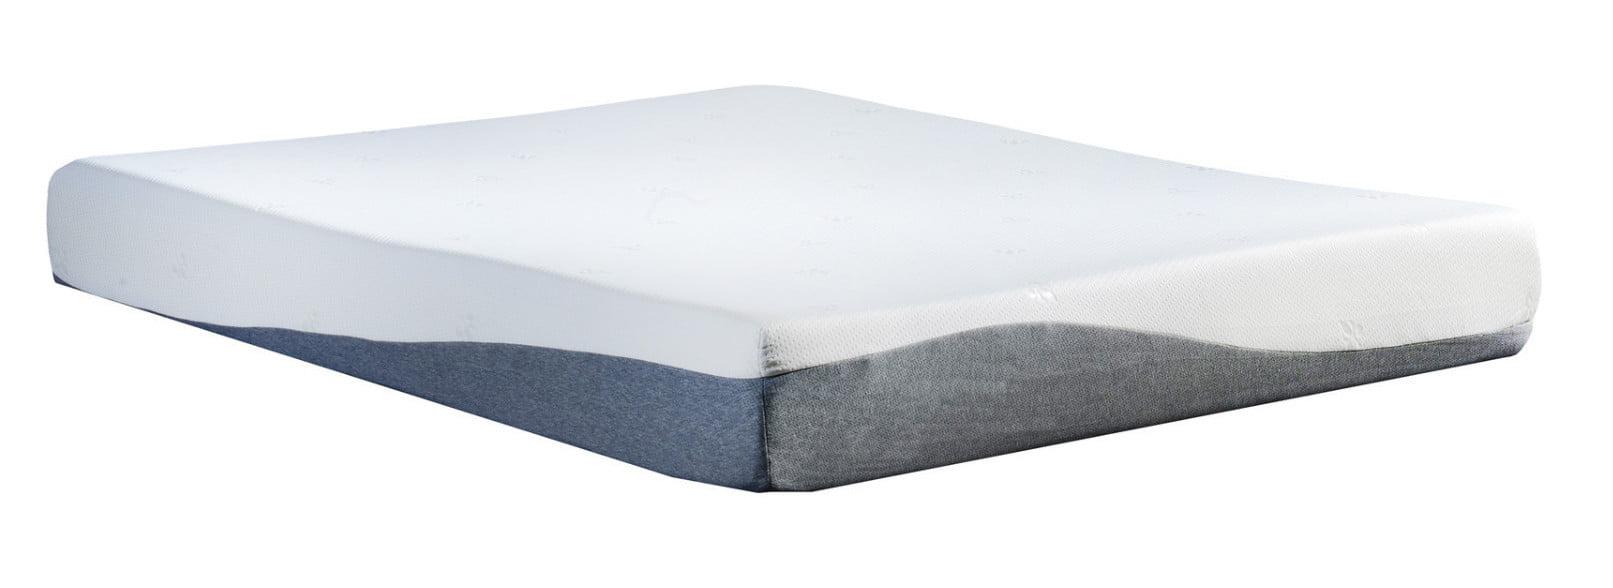 "10"" High-Density Gel & Memory Foam King Size Mattress, W Bamboo Cover� by"